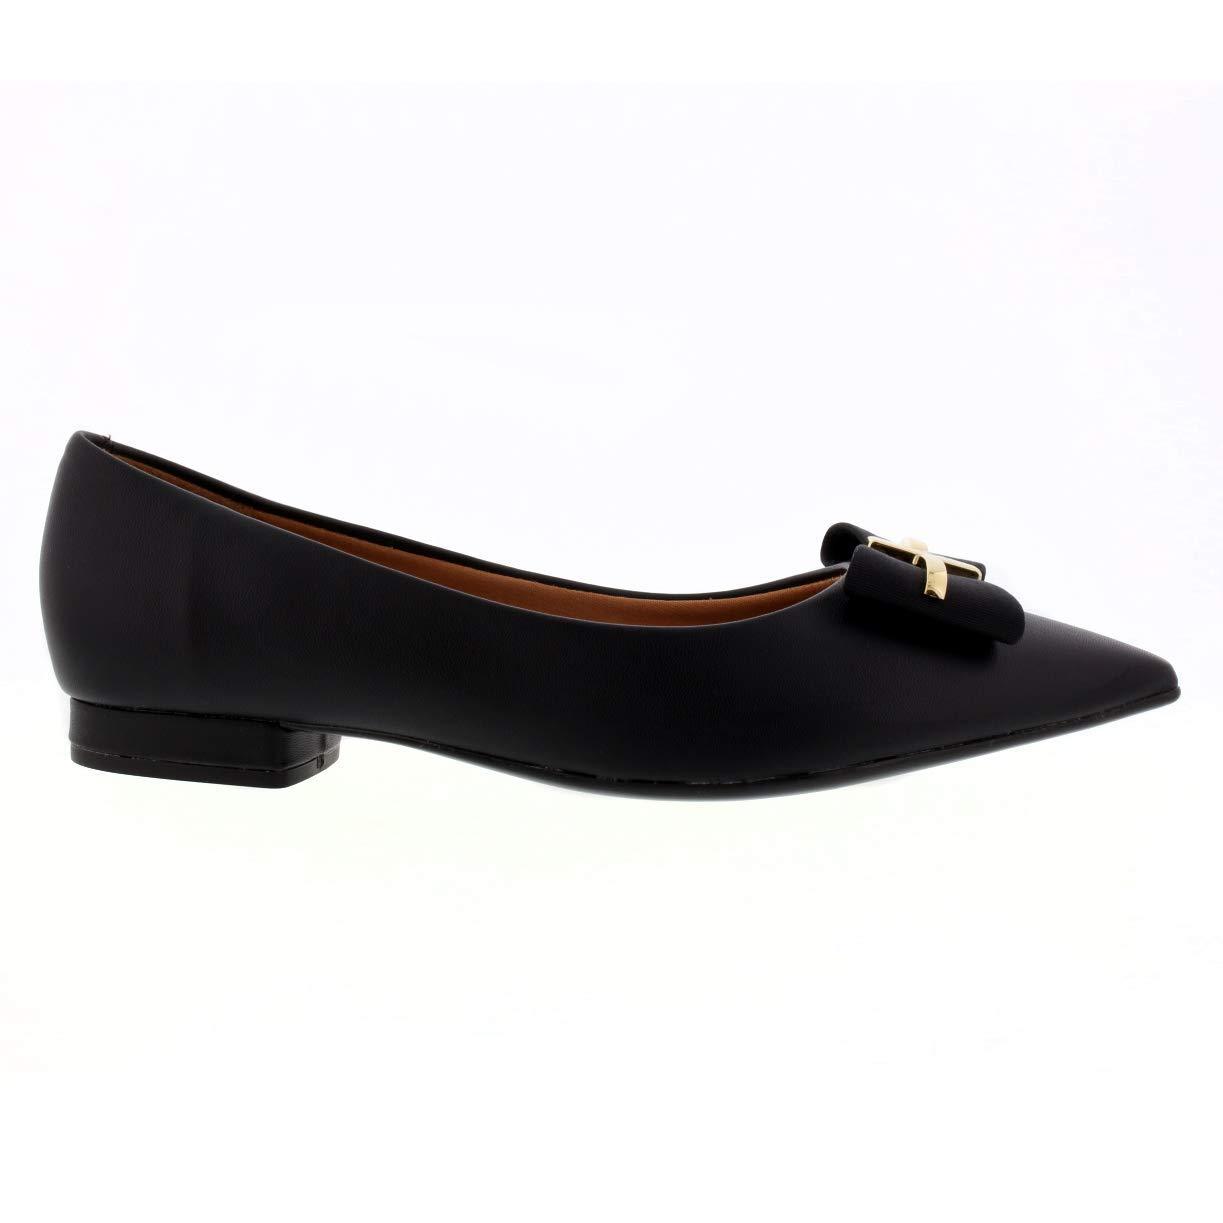 c088ead9c Vizzano Made in Brazil galm Stylish Flats Ballerinas Black Casual Wearing  Women Shoes Flats Women